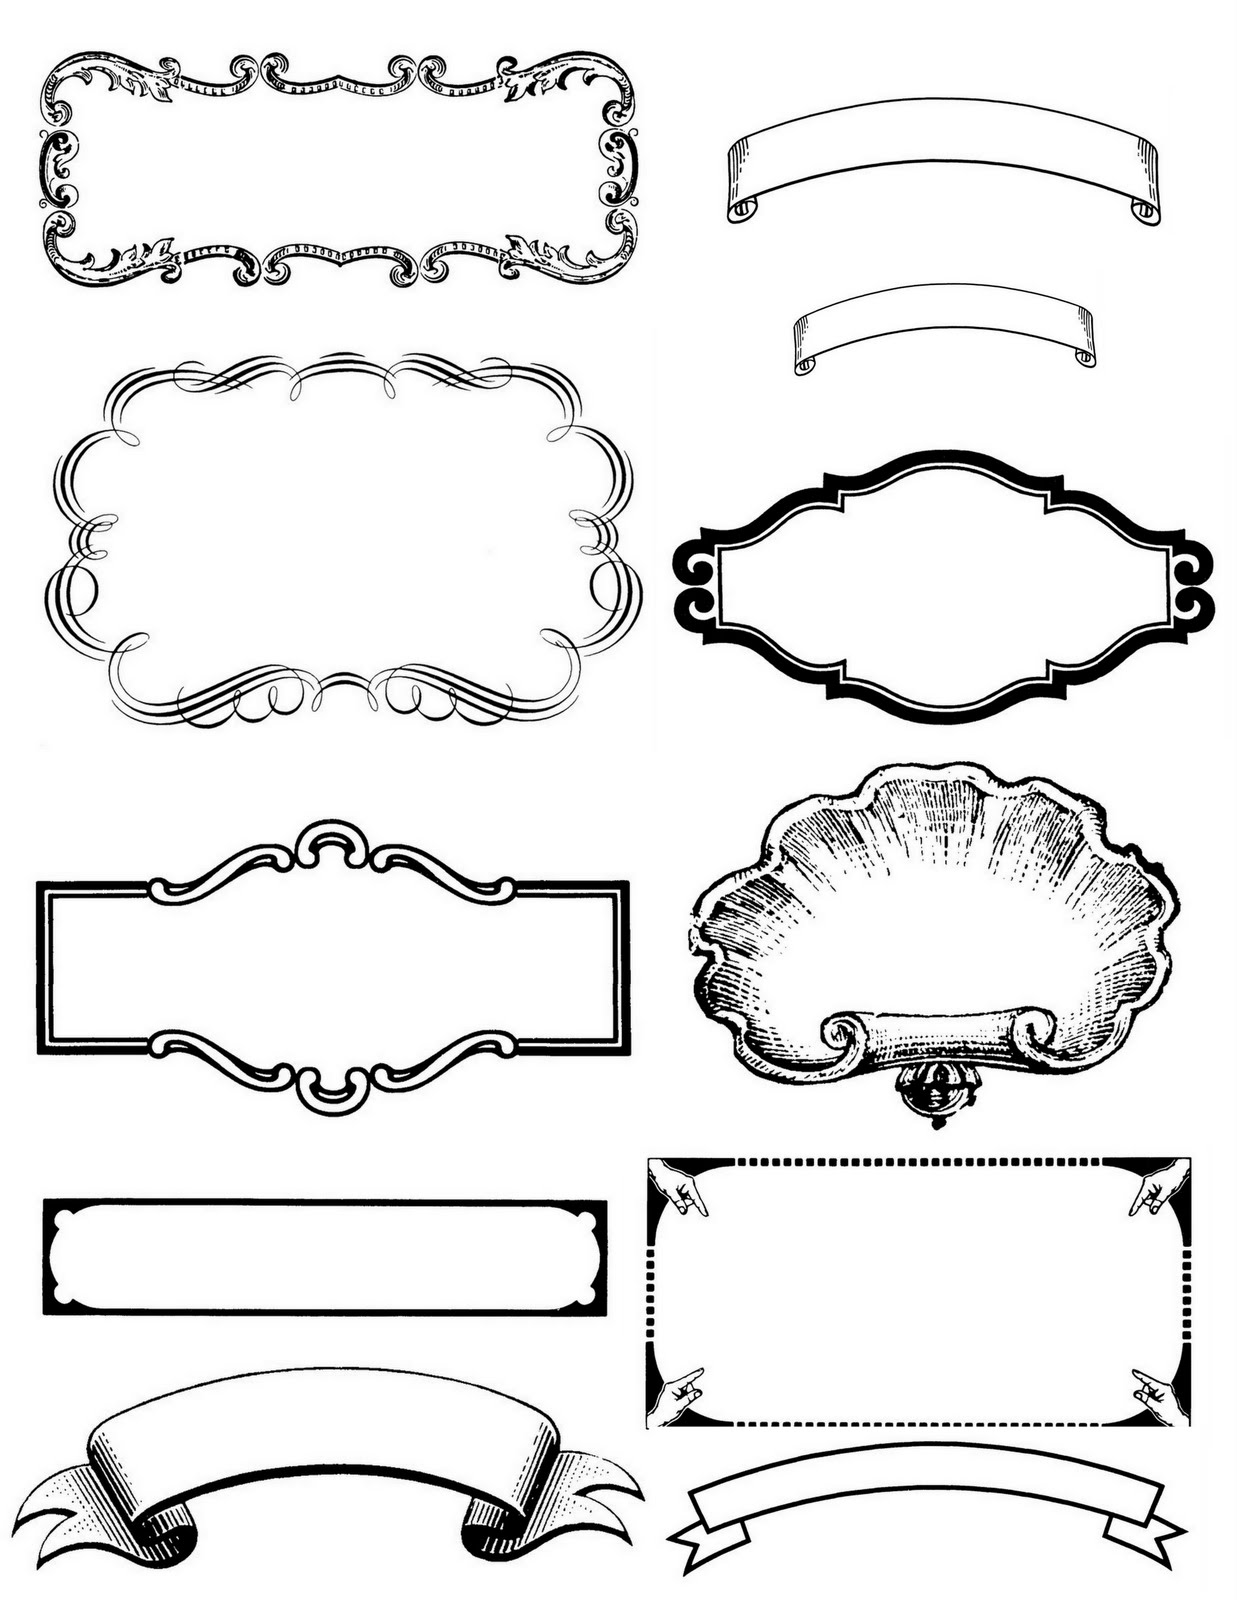 13 free vintage border templates images